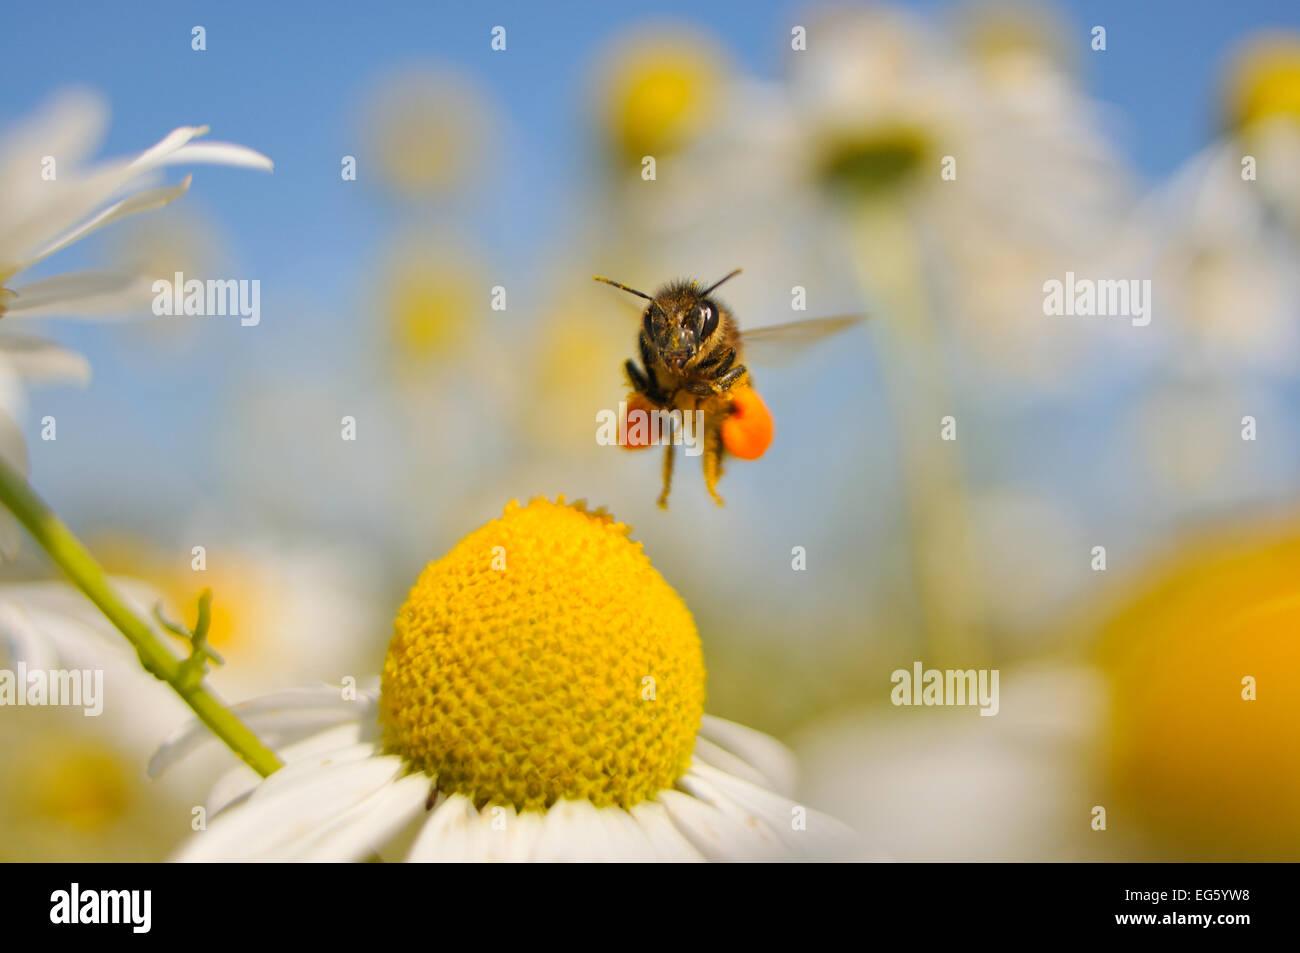 European Honey Bee (Apis mellifera) with pollen sacs flying towards a Scentless mayweed (Tripleurospermum inodorum) - Stock Image